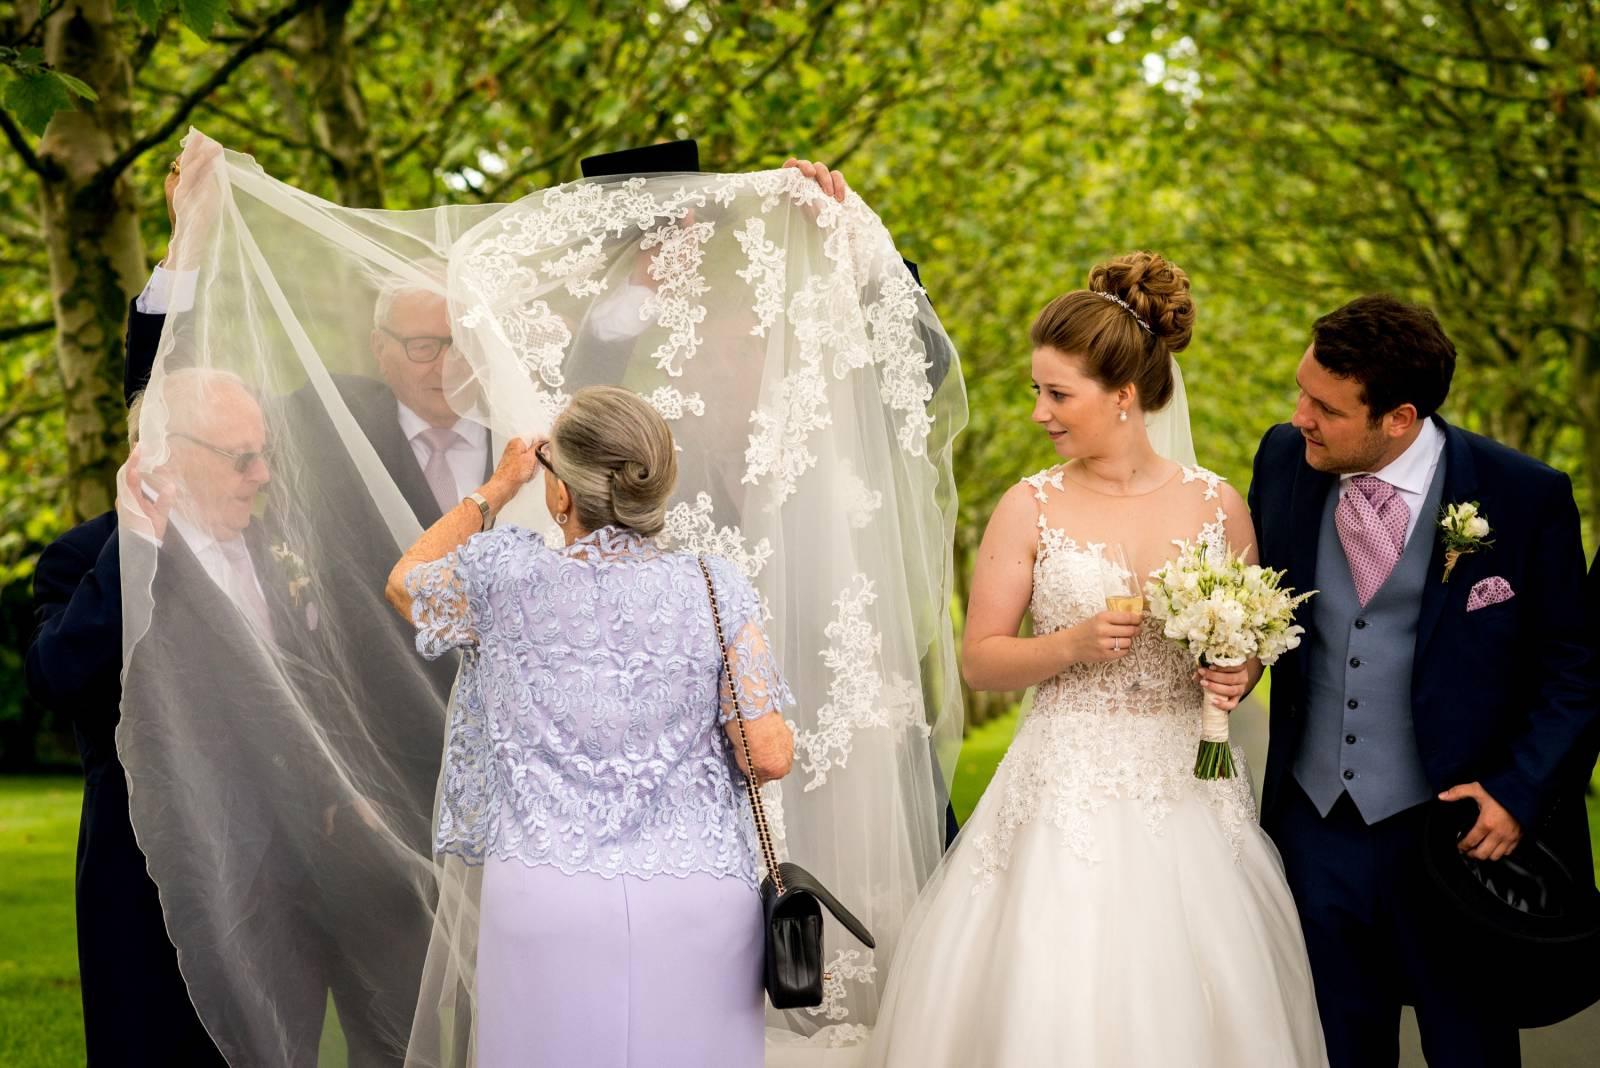 Fotografie Melody - Huwelijksfotograaf - Trouwfotograaf - House of Weddings - 12